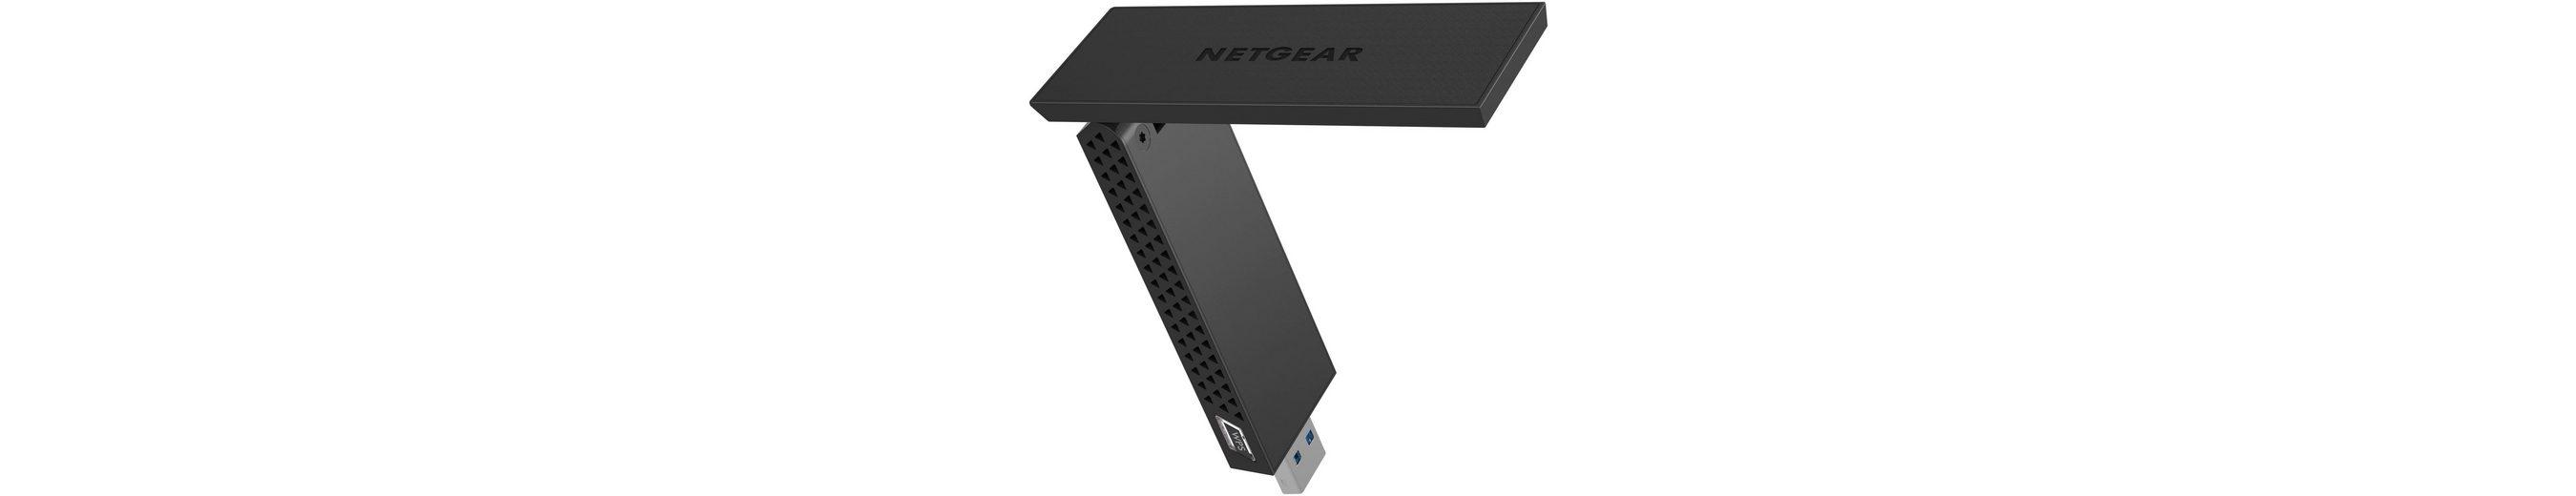 Netgear WLAN Adapter »AC1200-High-Gain-WL-USB-Adapt«